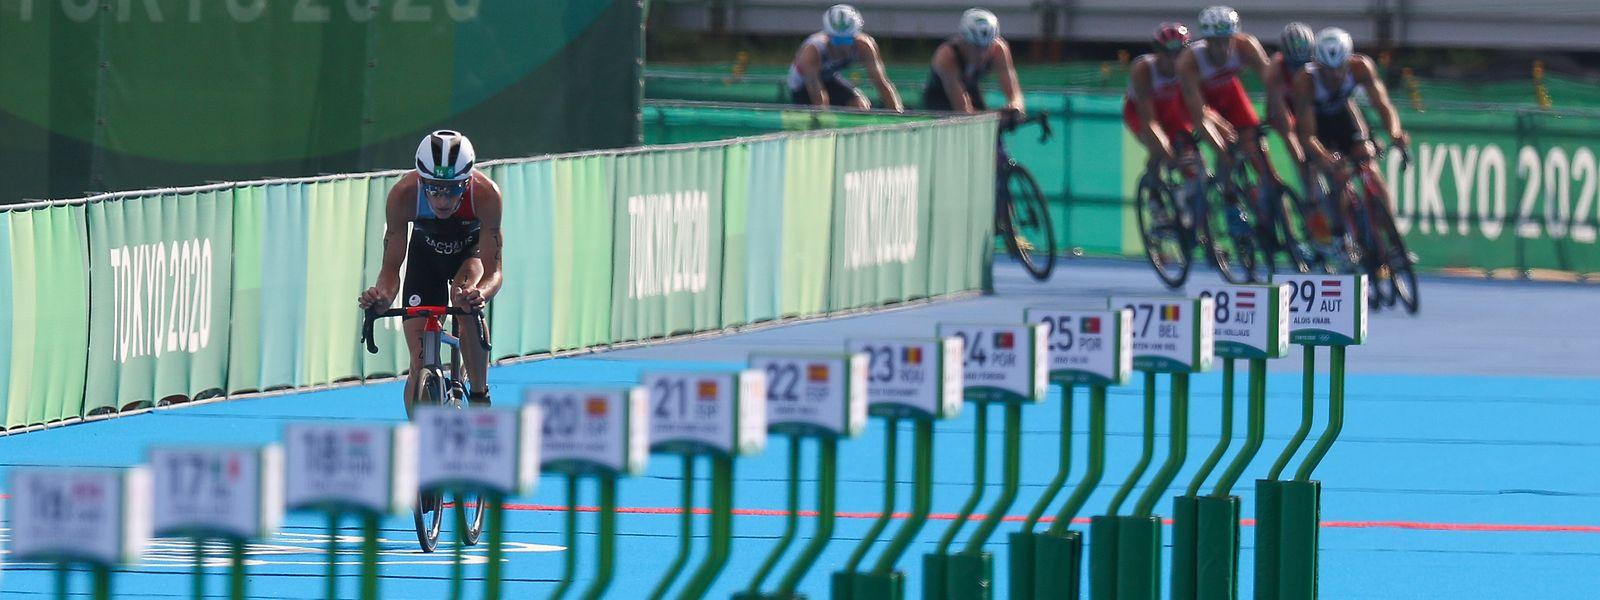 Stefan Zachäus führt das Rennen an.